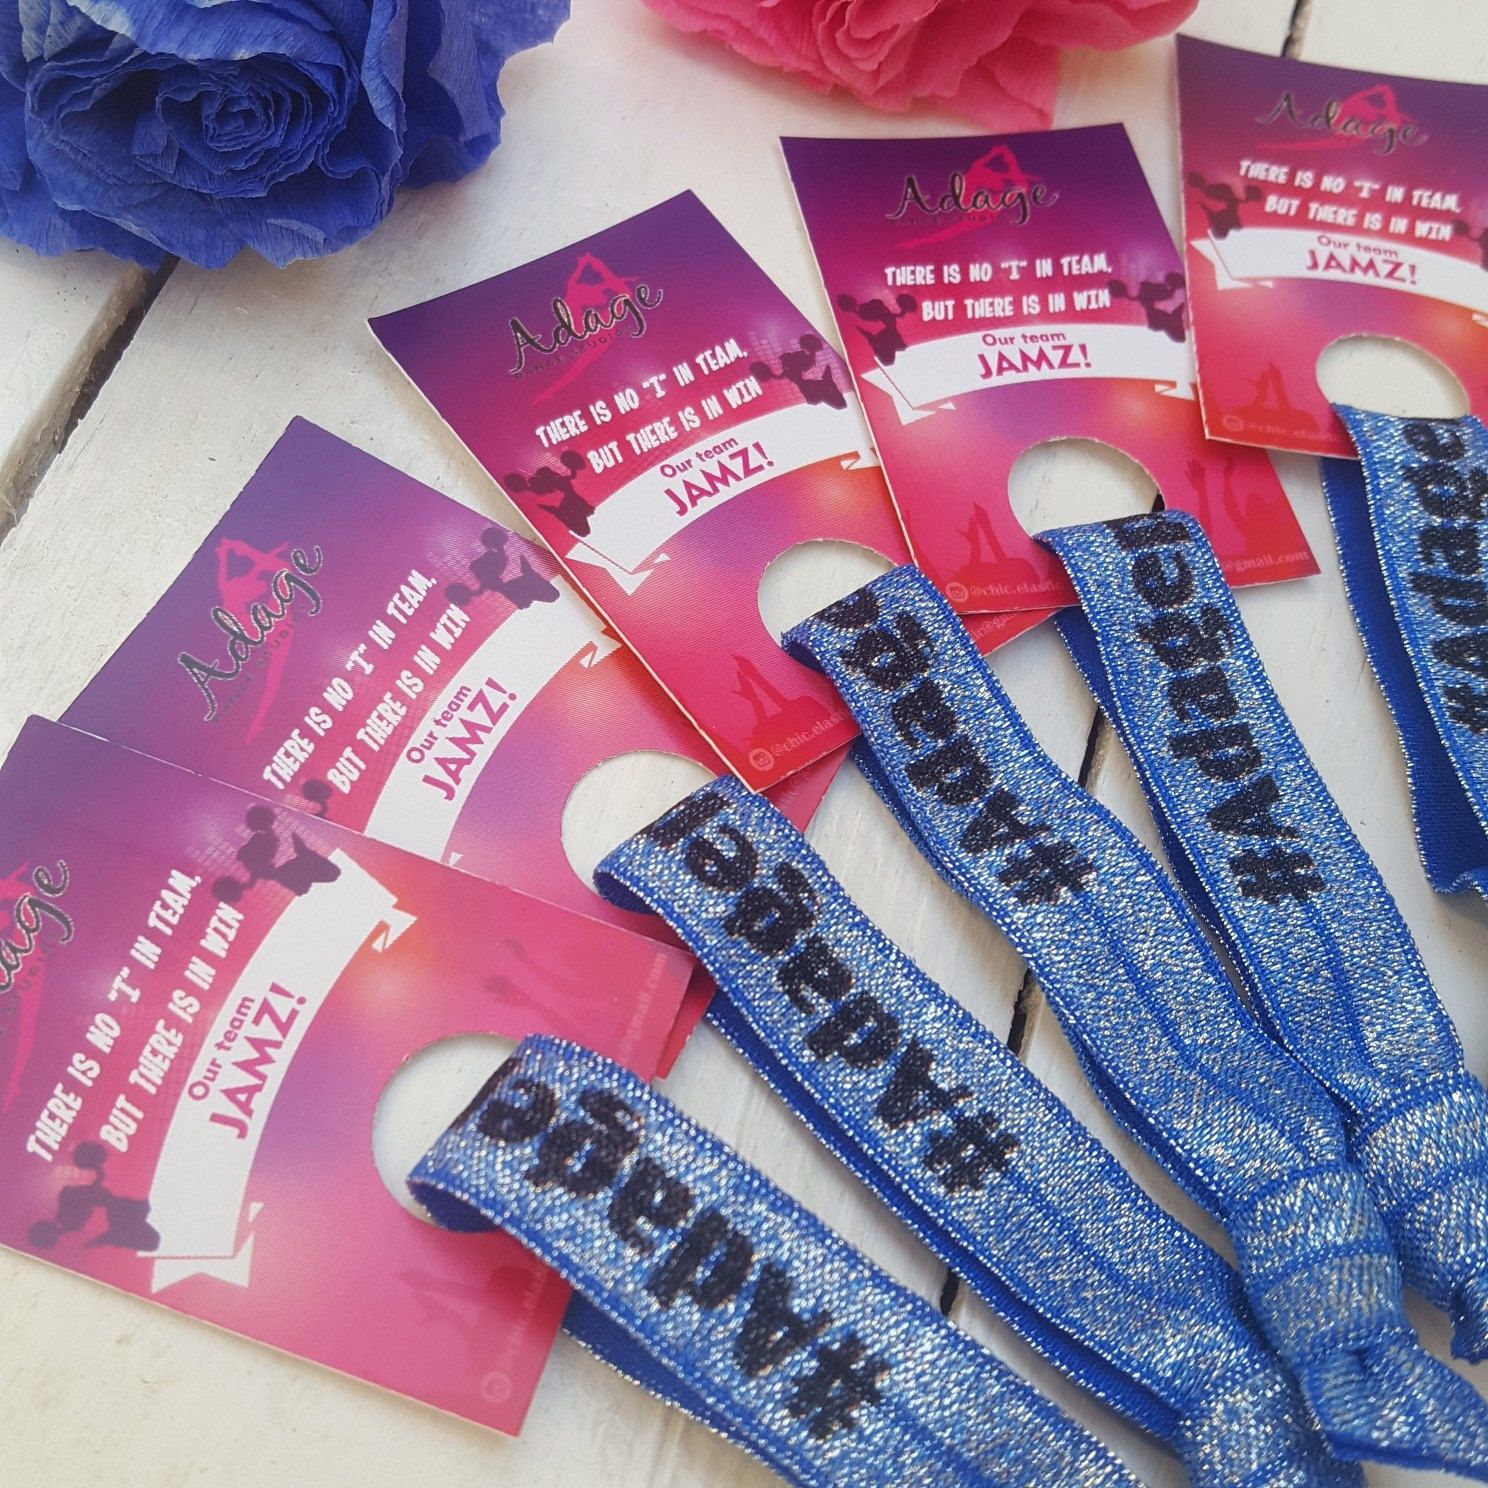 Wedding gift hair ties - survival kit - bridesmaid favors - wedding ...